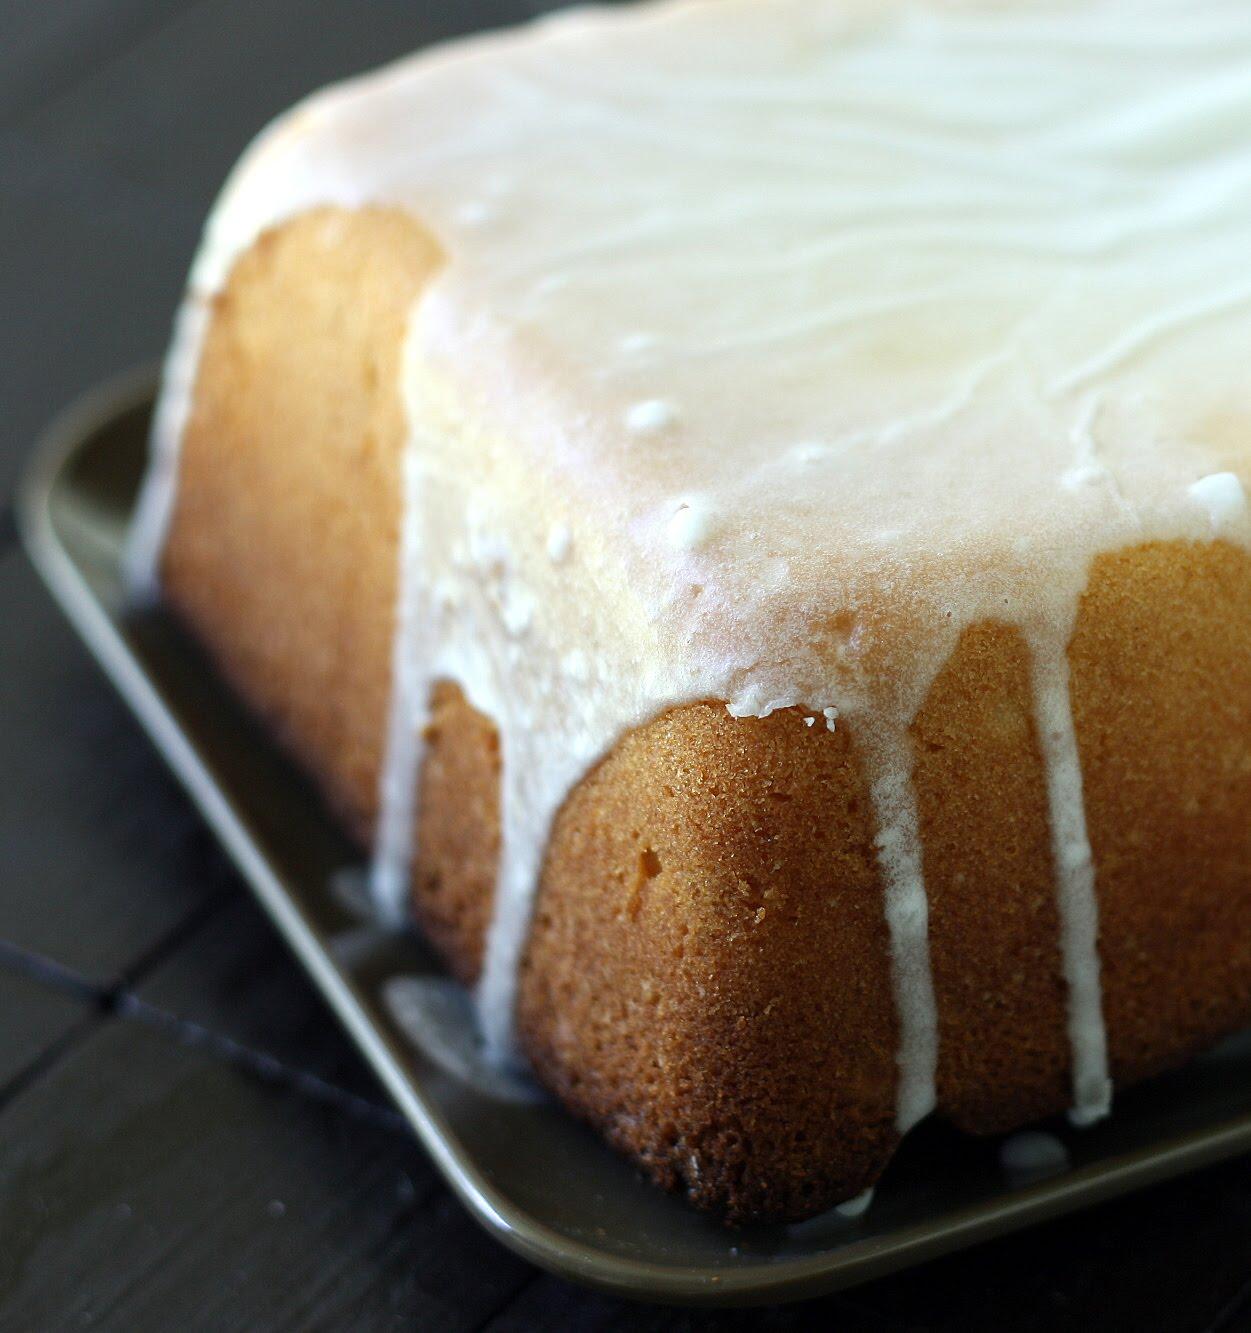 Mangio da Sola: Buttermilk Pound Cake & Big News